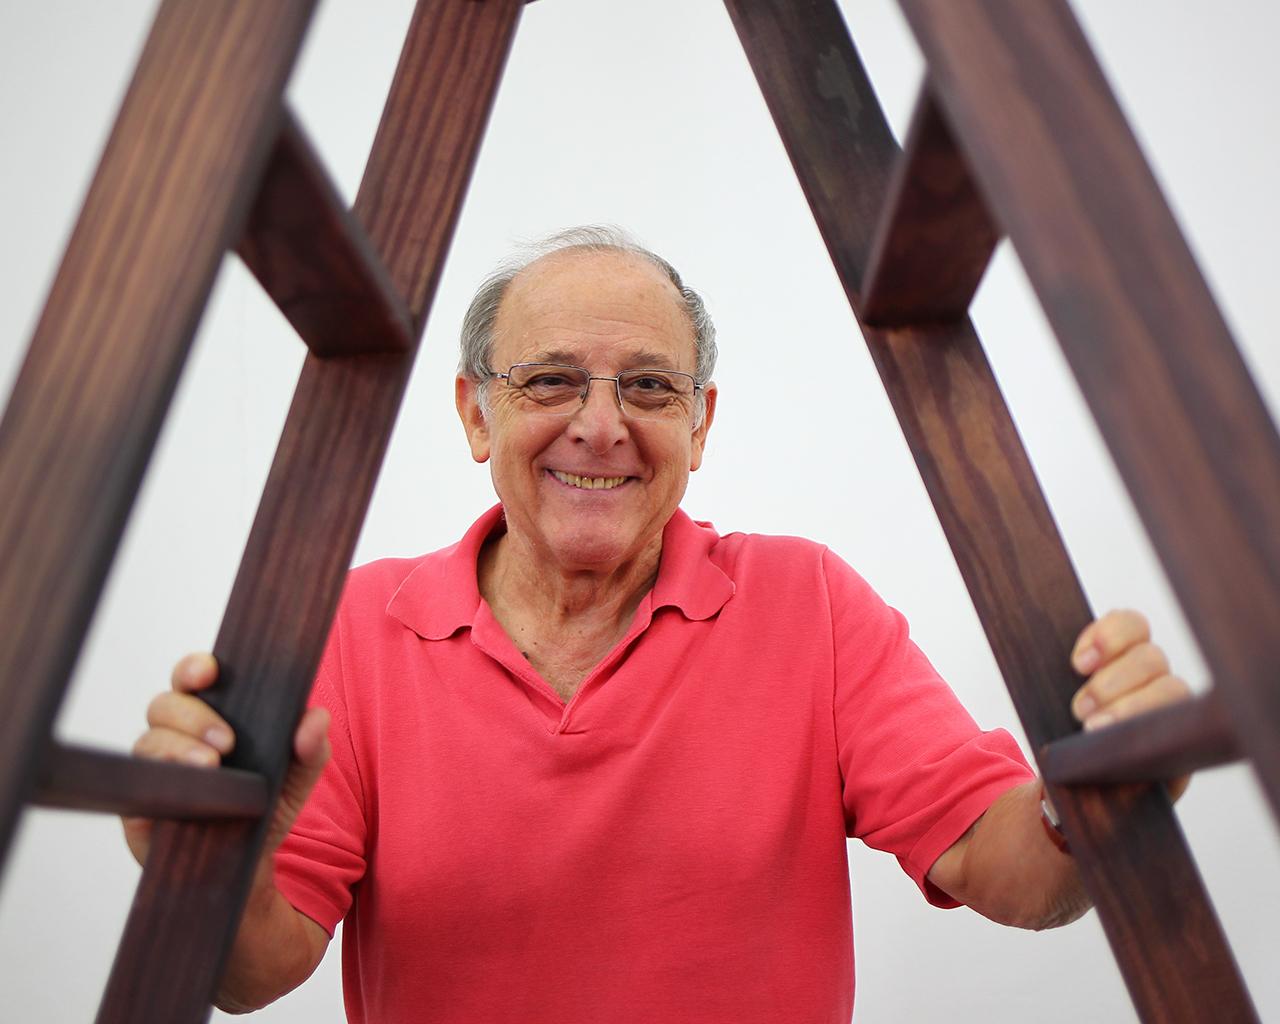 Emilio Gutierrez Caba